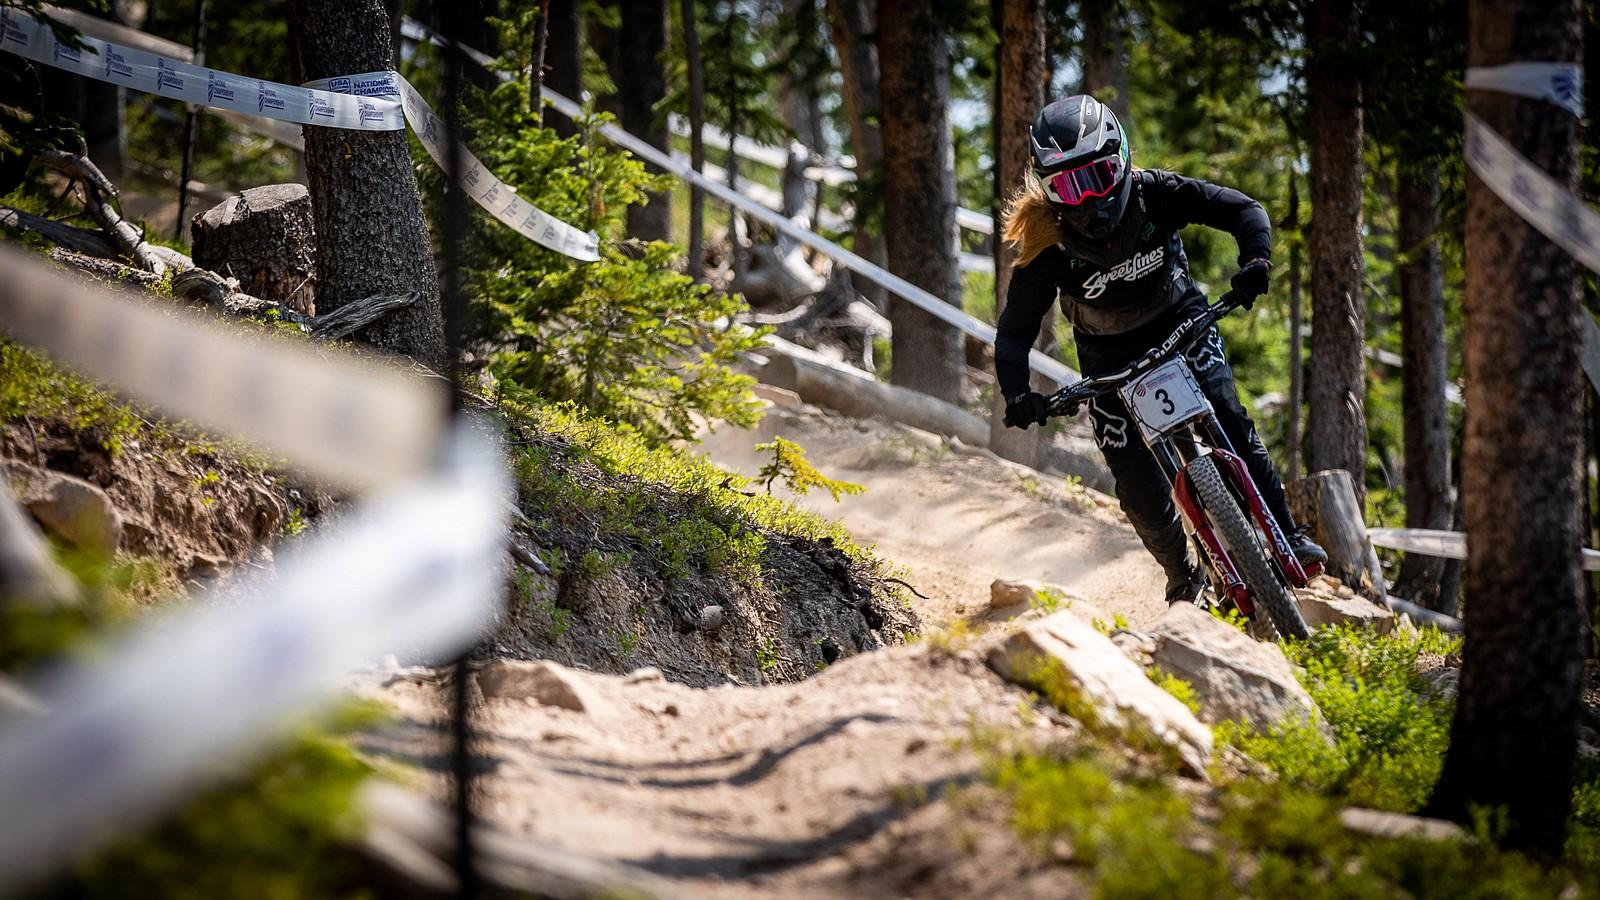 Sydney Haberman - US National Champs Downhill Photo Blast - Mountain Biking Pictures - Vital MTB